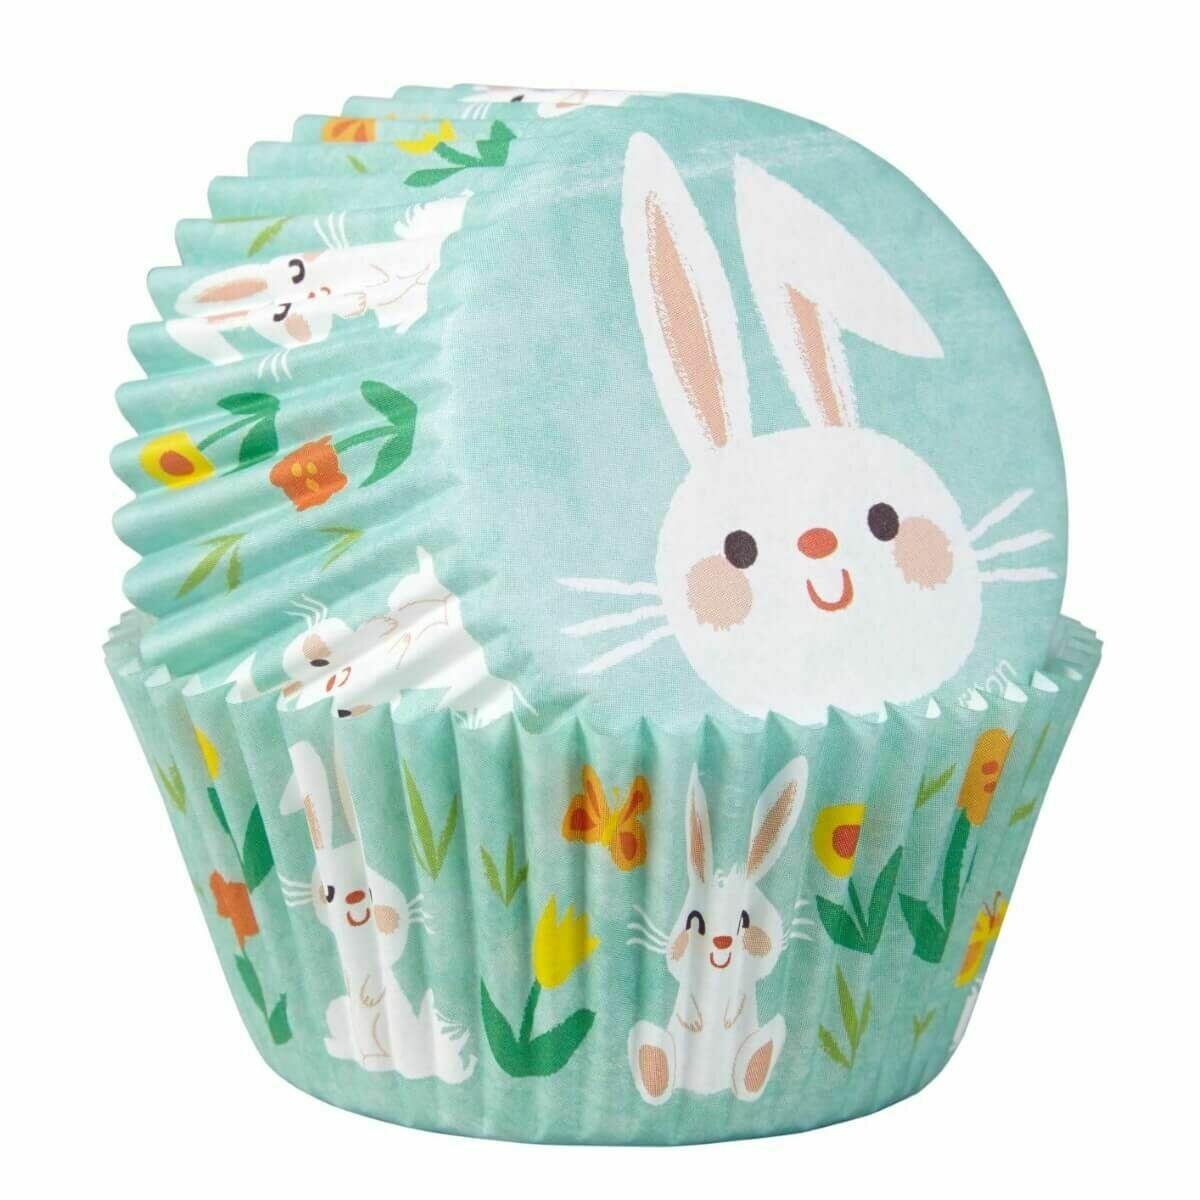 Wilton Easter Cupcake Cases -EASTER BUNNY - Θήκες ψησίματος με πασχαλινό θέμα 75 τεμ